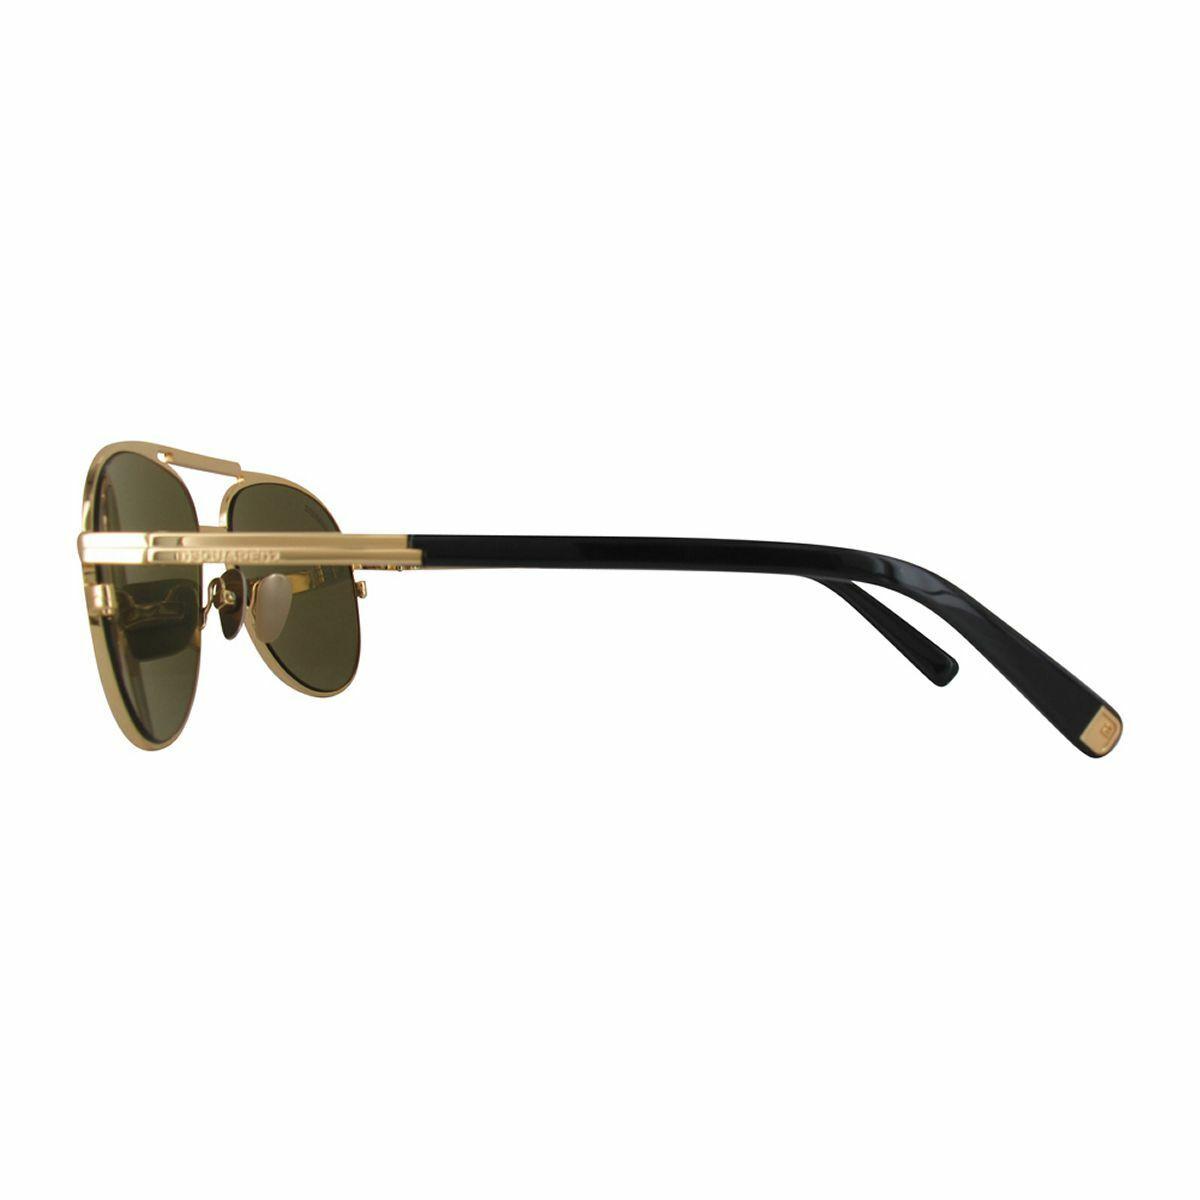 Dsquared2 Women's Sunglasses DQ0280-30N-57 Shiny Endura Gold/Green